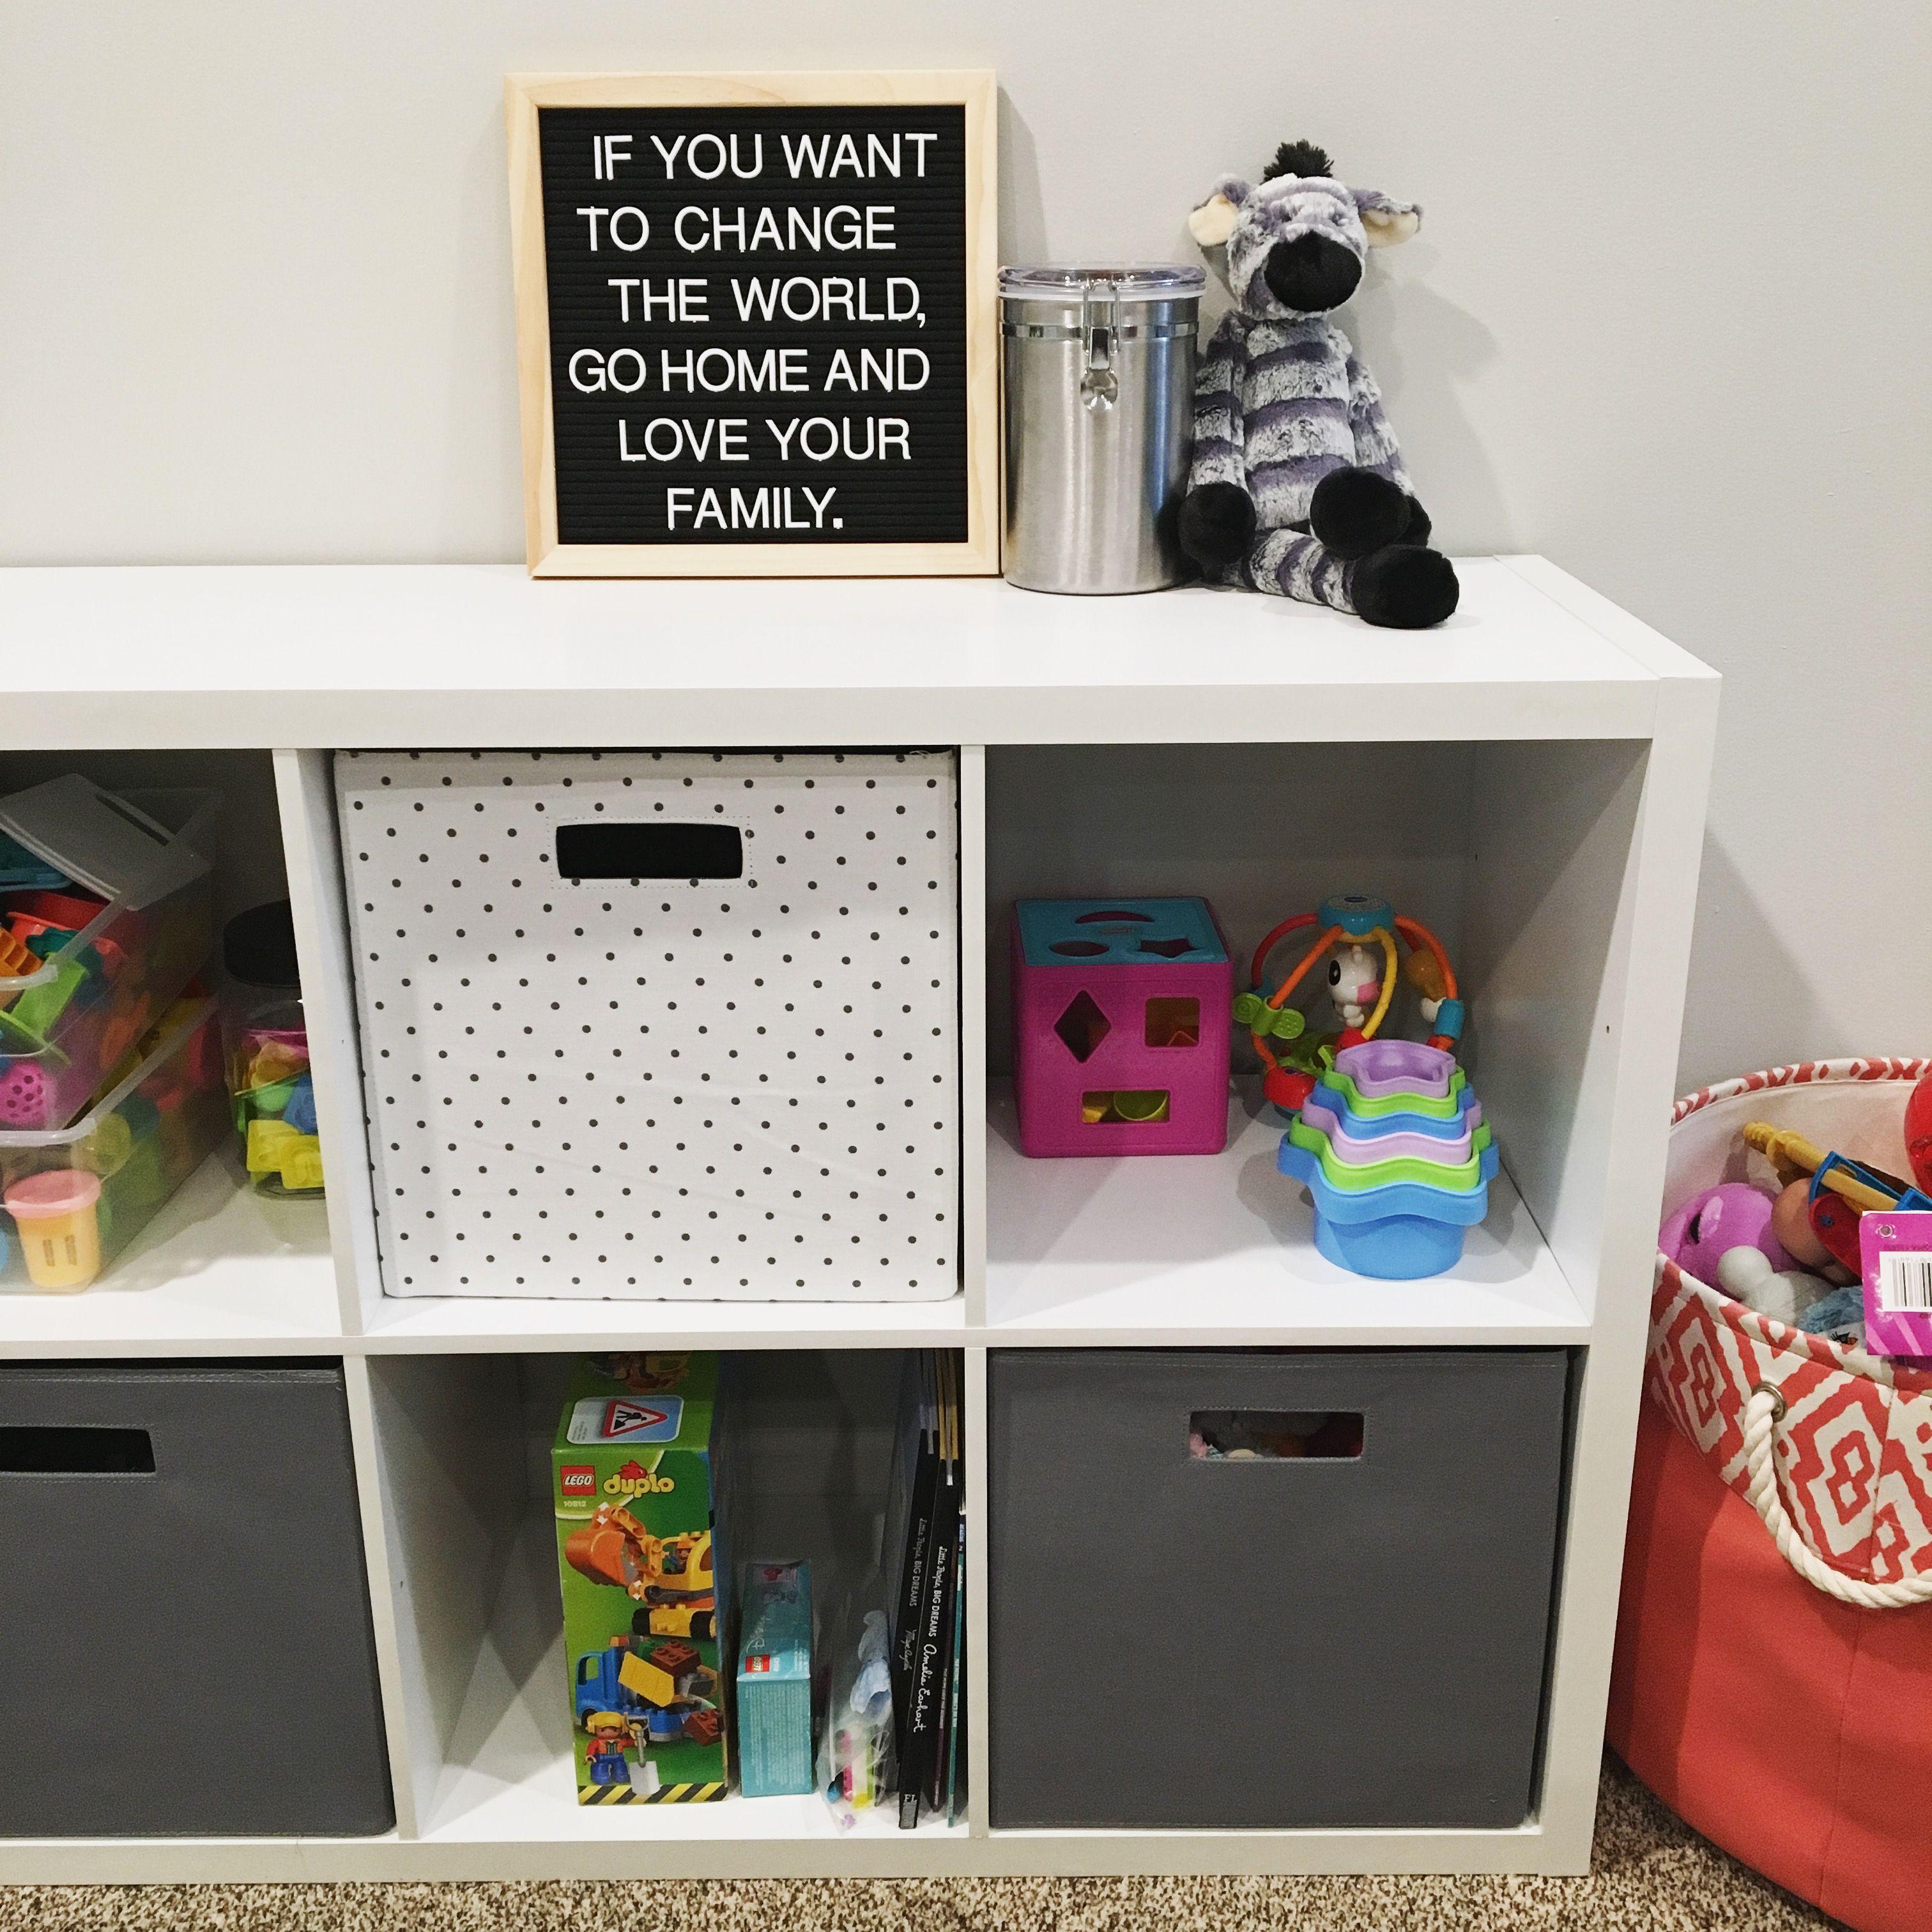 Best Toy Storage Shelves Bins From Target Threshold Brand Very Simple To Put Together And My Fav Felt Let Shelf Bins Toy Storage Locker Storage